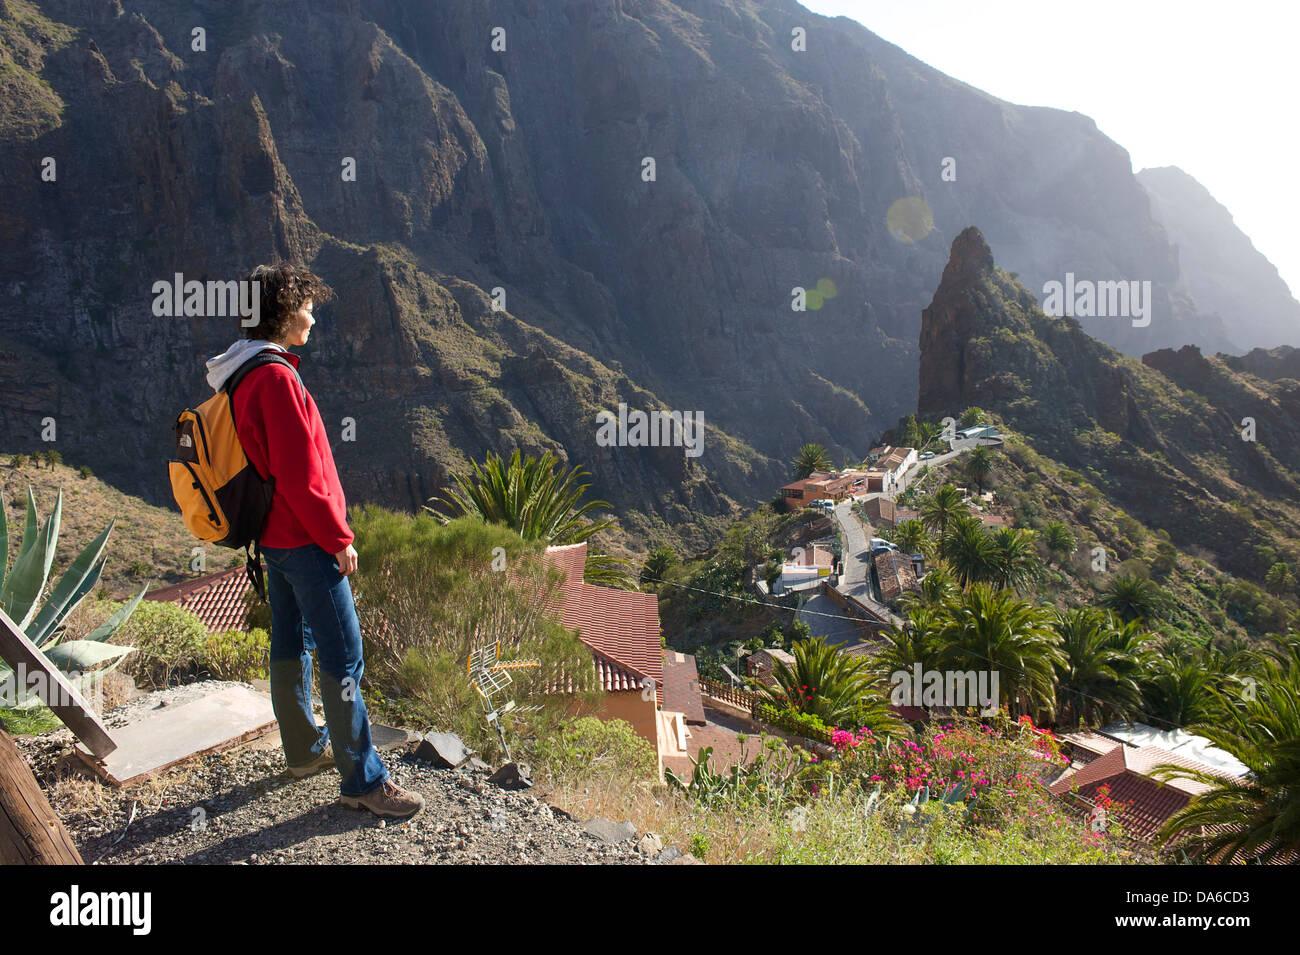 Teneriffa, Teneriffa, Kanaren, Kanarische Inseln, Spanien, Spanisch, Europa, Masca, Berglandschaft, Berglandschaften, Stockbild